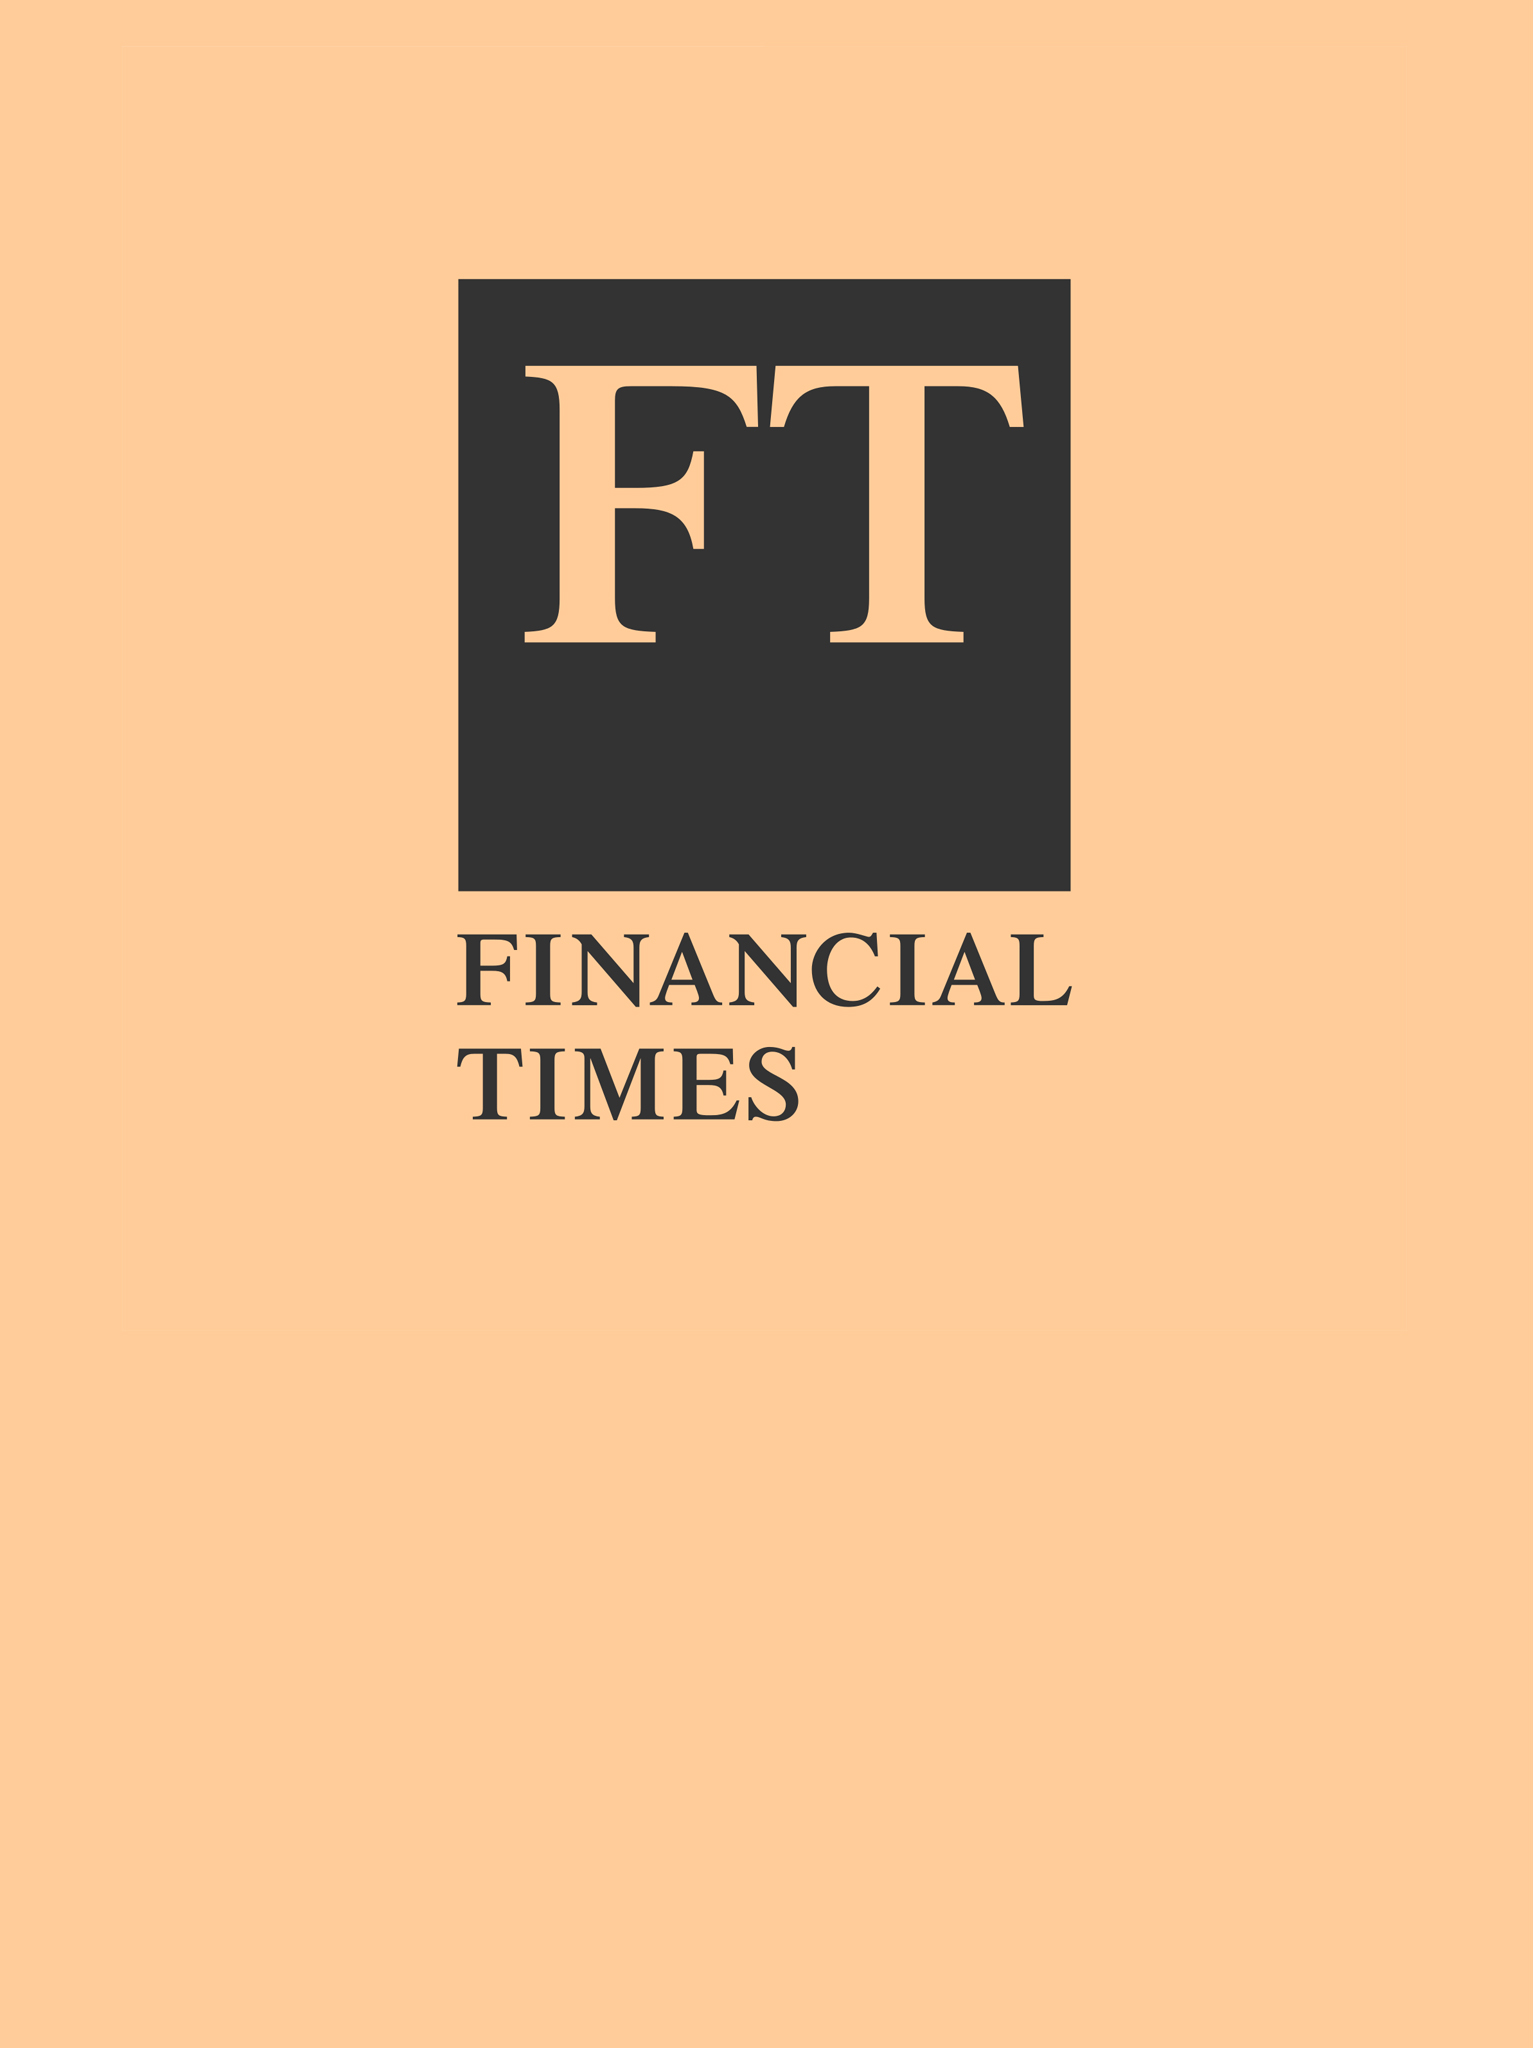 Financial Times – May 16